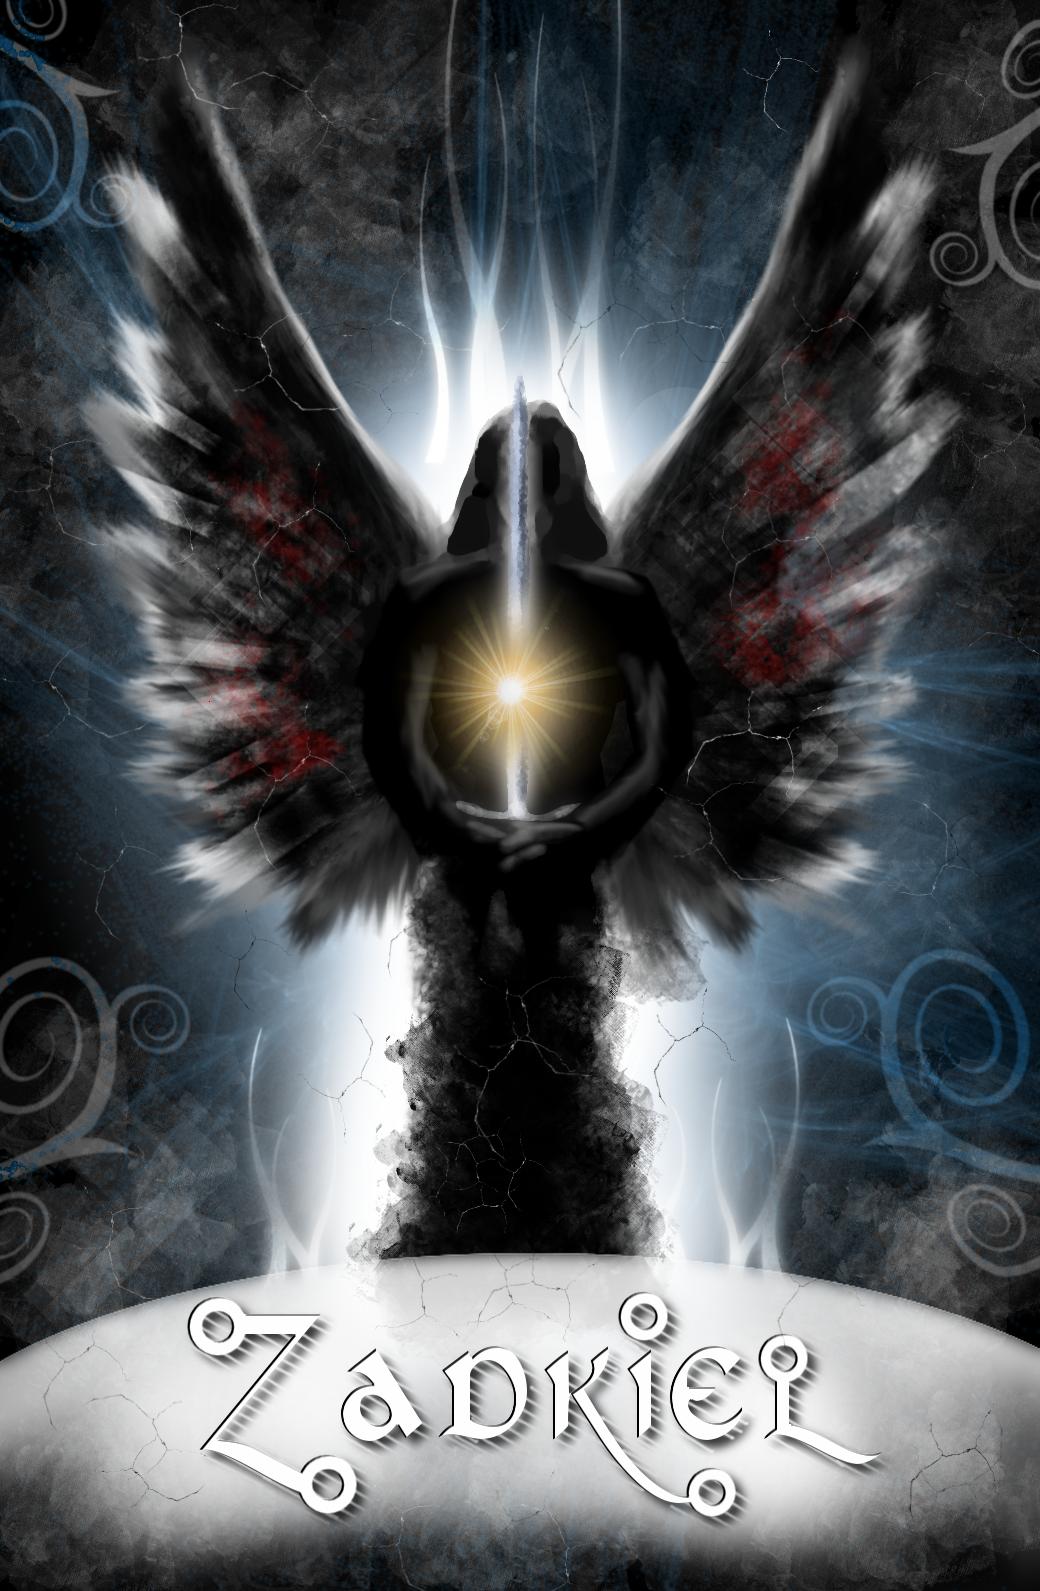 Engelkarte Zadkiel